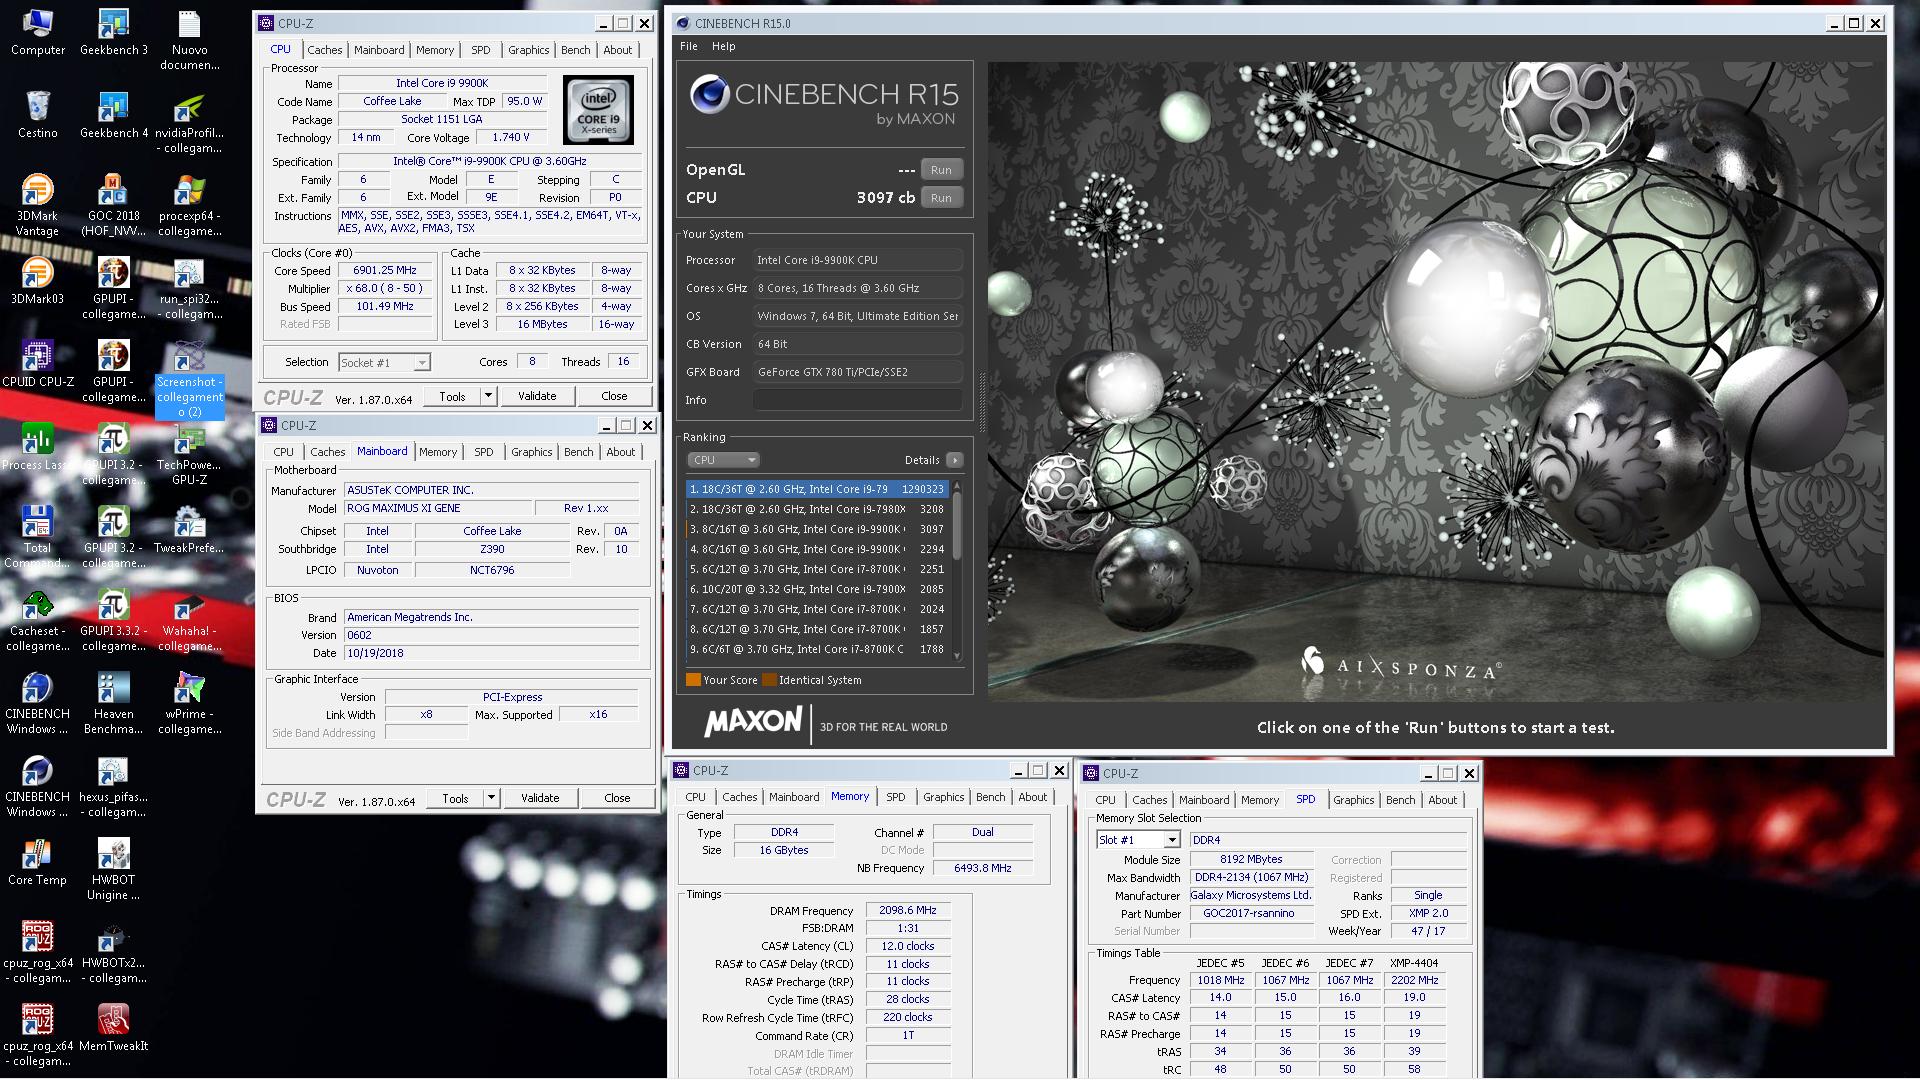 rsannino`s Cinebench - R15 score: 3097 cb with a Core i9 9900K